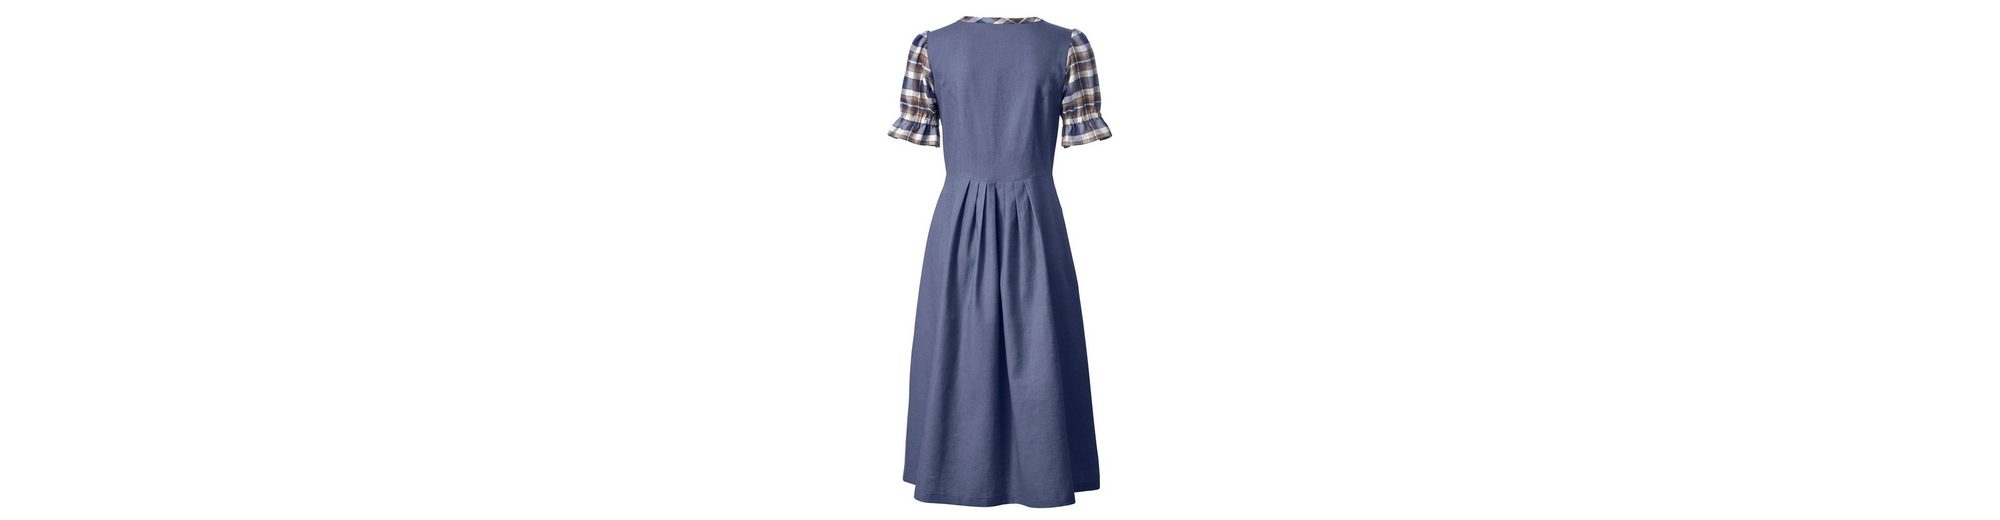 Mona Kleid in trachtiger Landhausromantik Rabatt 2018 Unisex RDsbZc15d